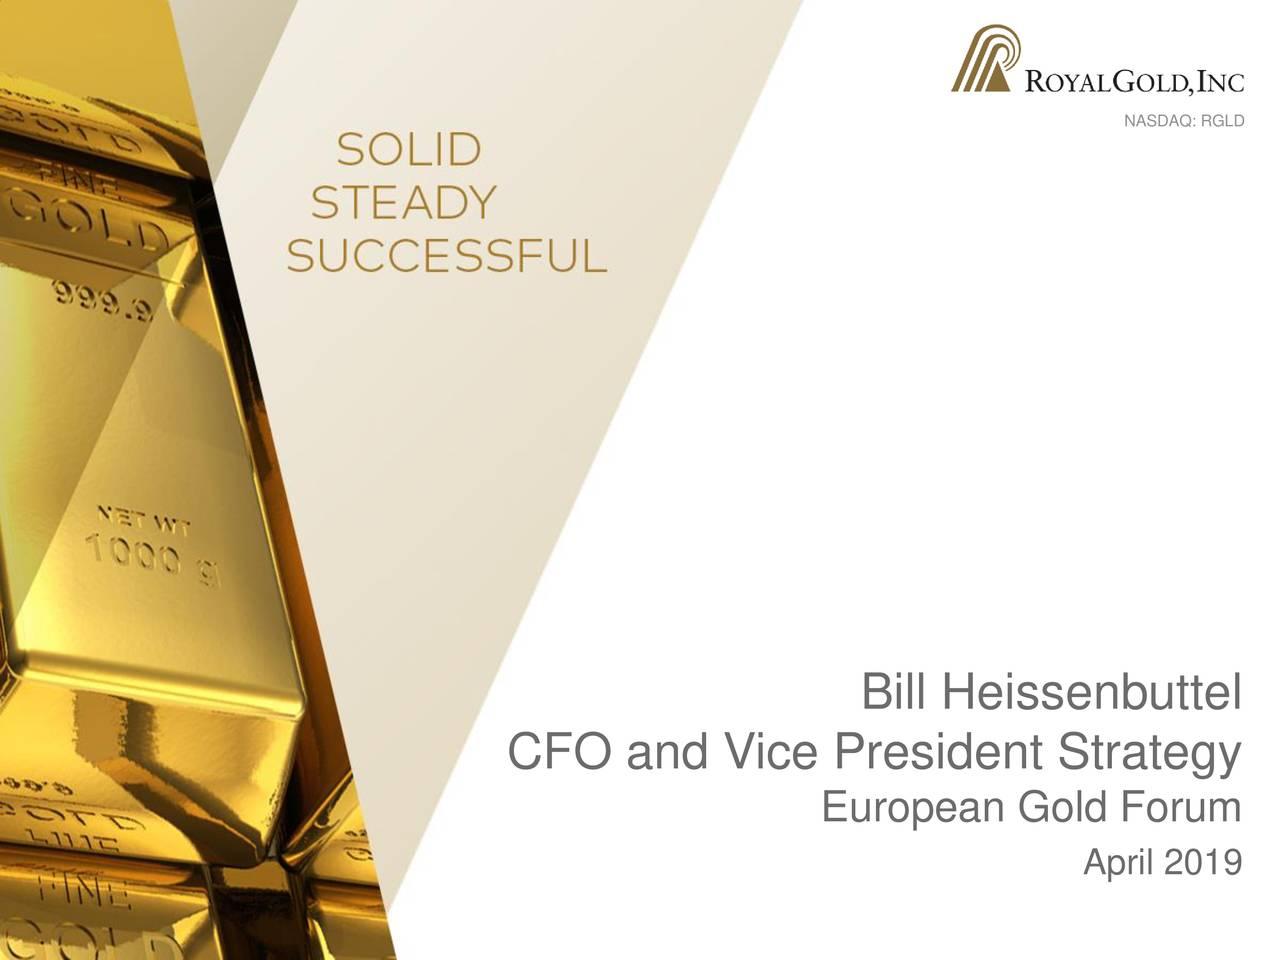 Bill Heissenbuttel CFO and Vice President Strategy European Gold Forum April 2019